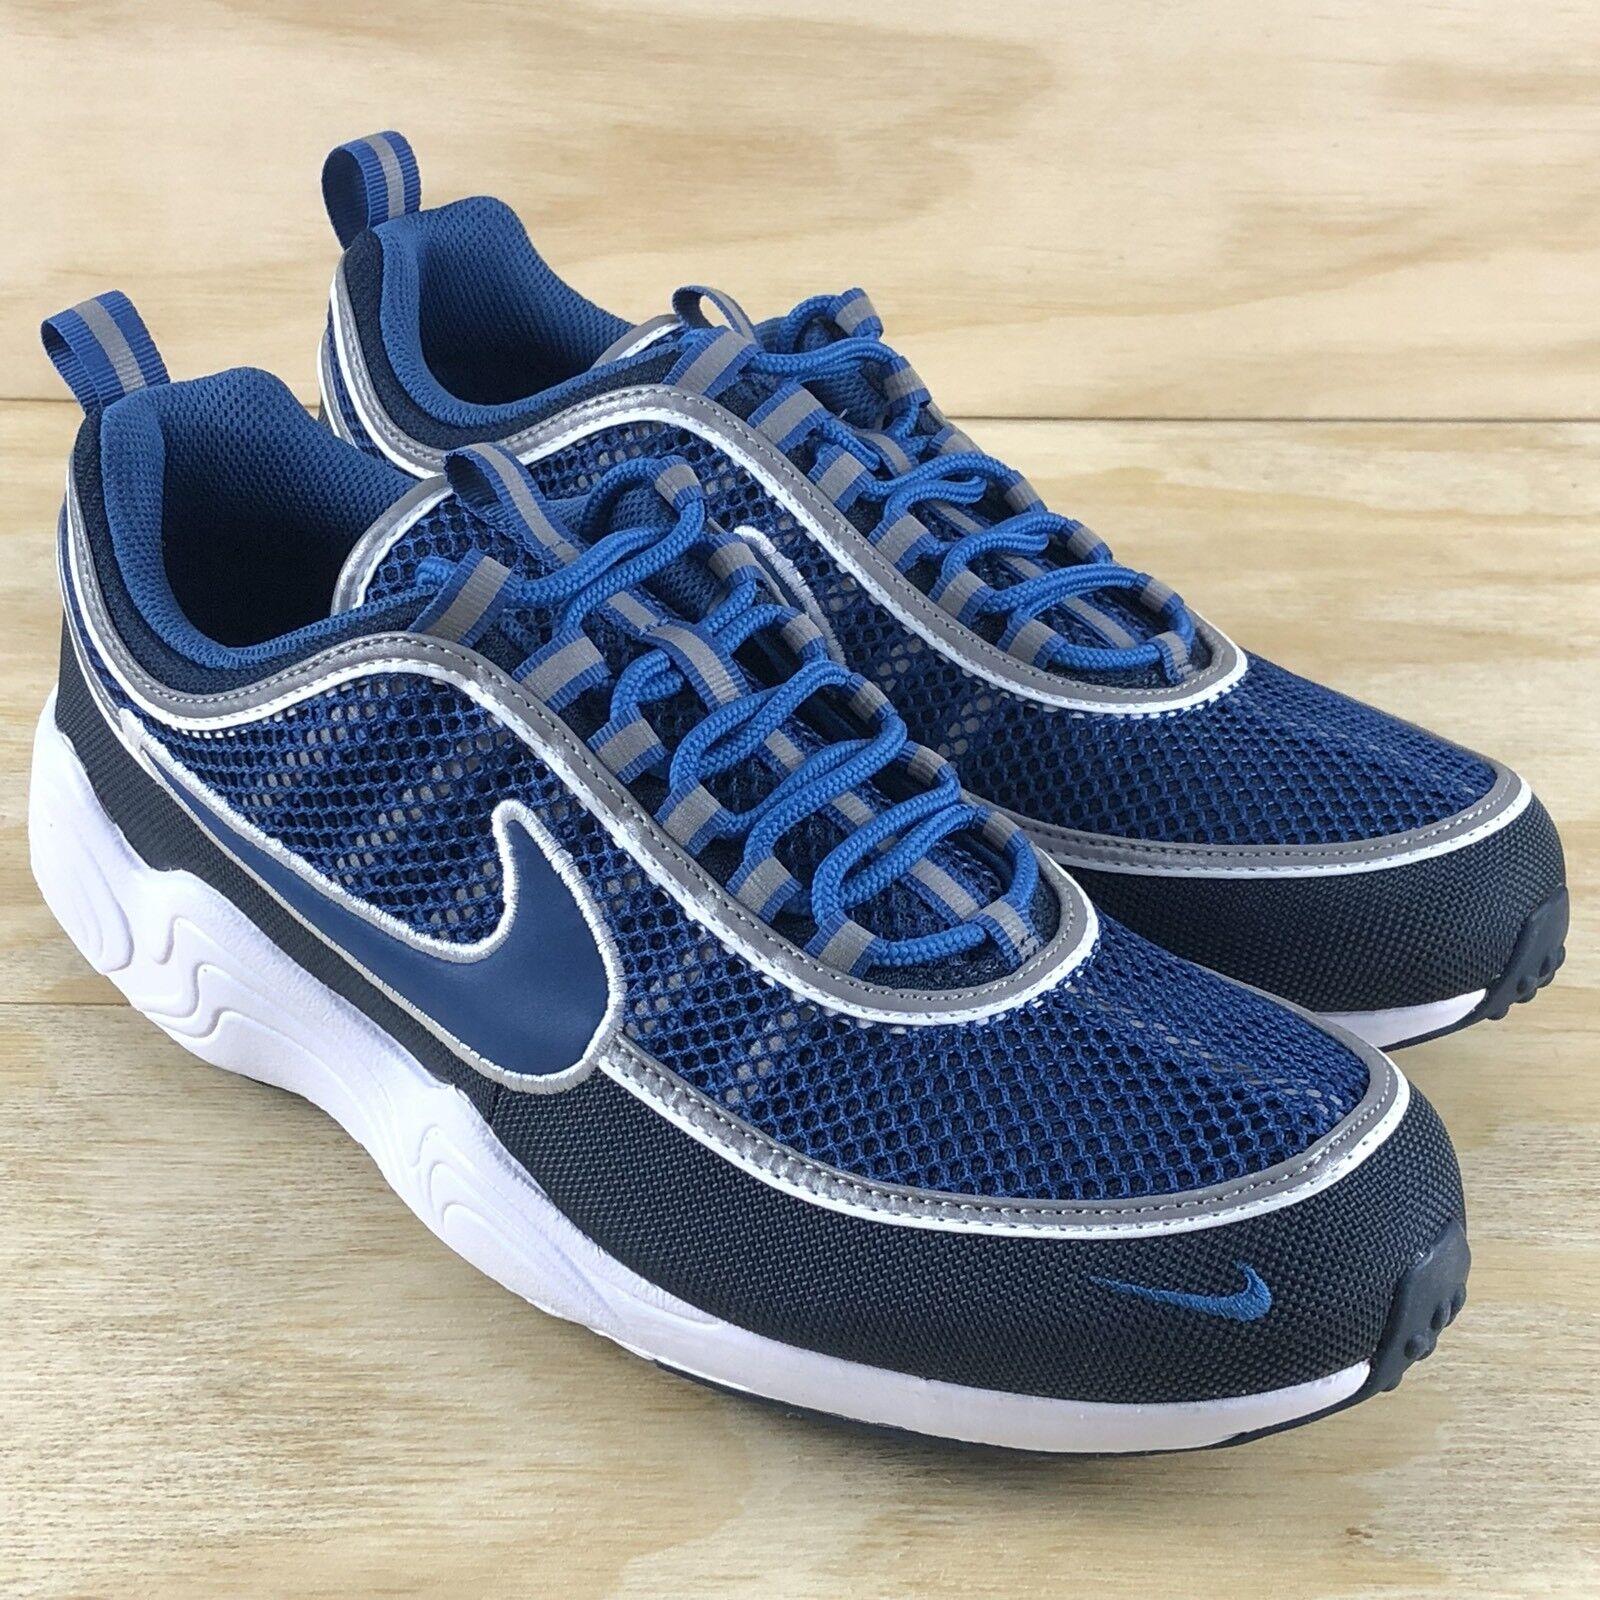 Nike Air Zoom Spiridon 16 Armorized Navy Blue White Mens Shoes (926955-400) Size